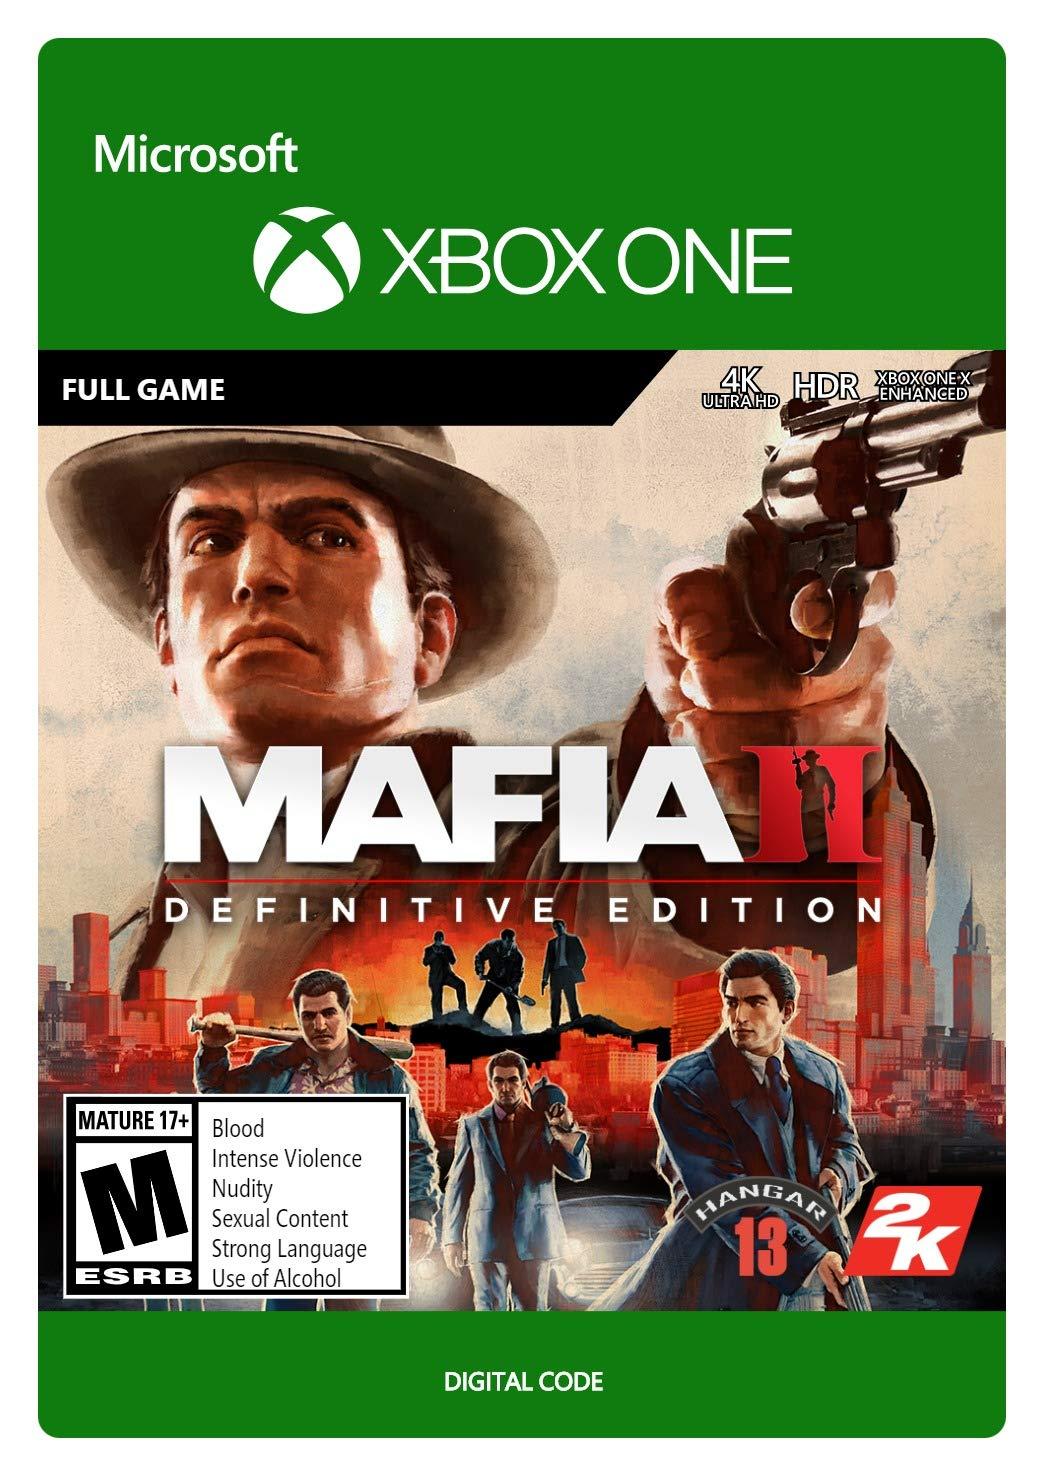 Mafia II Definitive Edition - New item Digital Xbox Code One Import